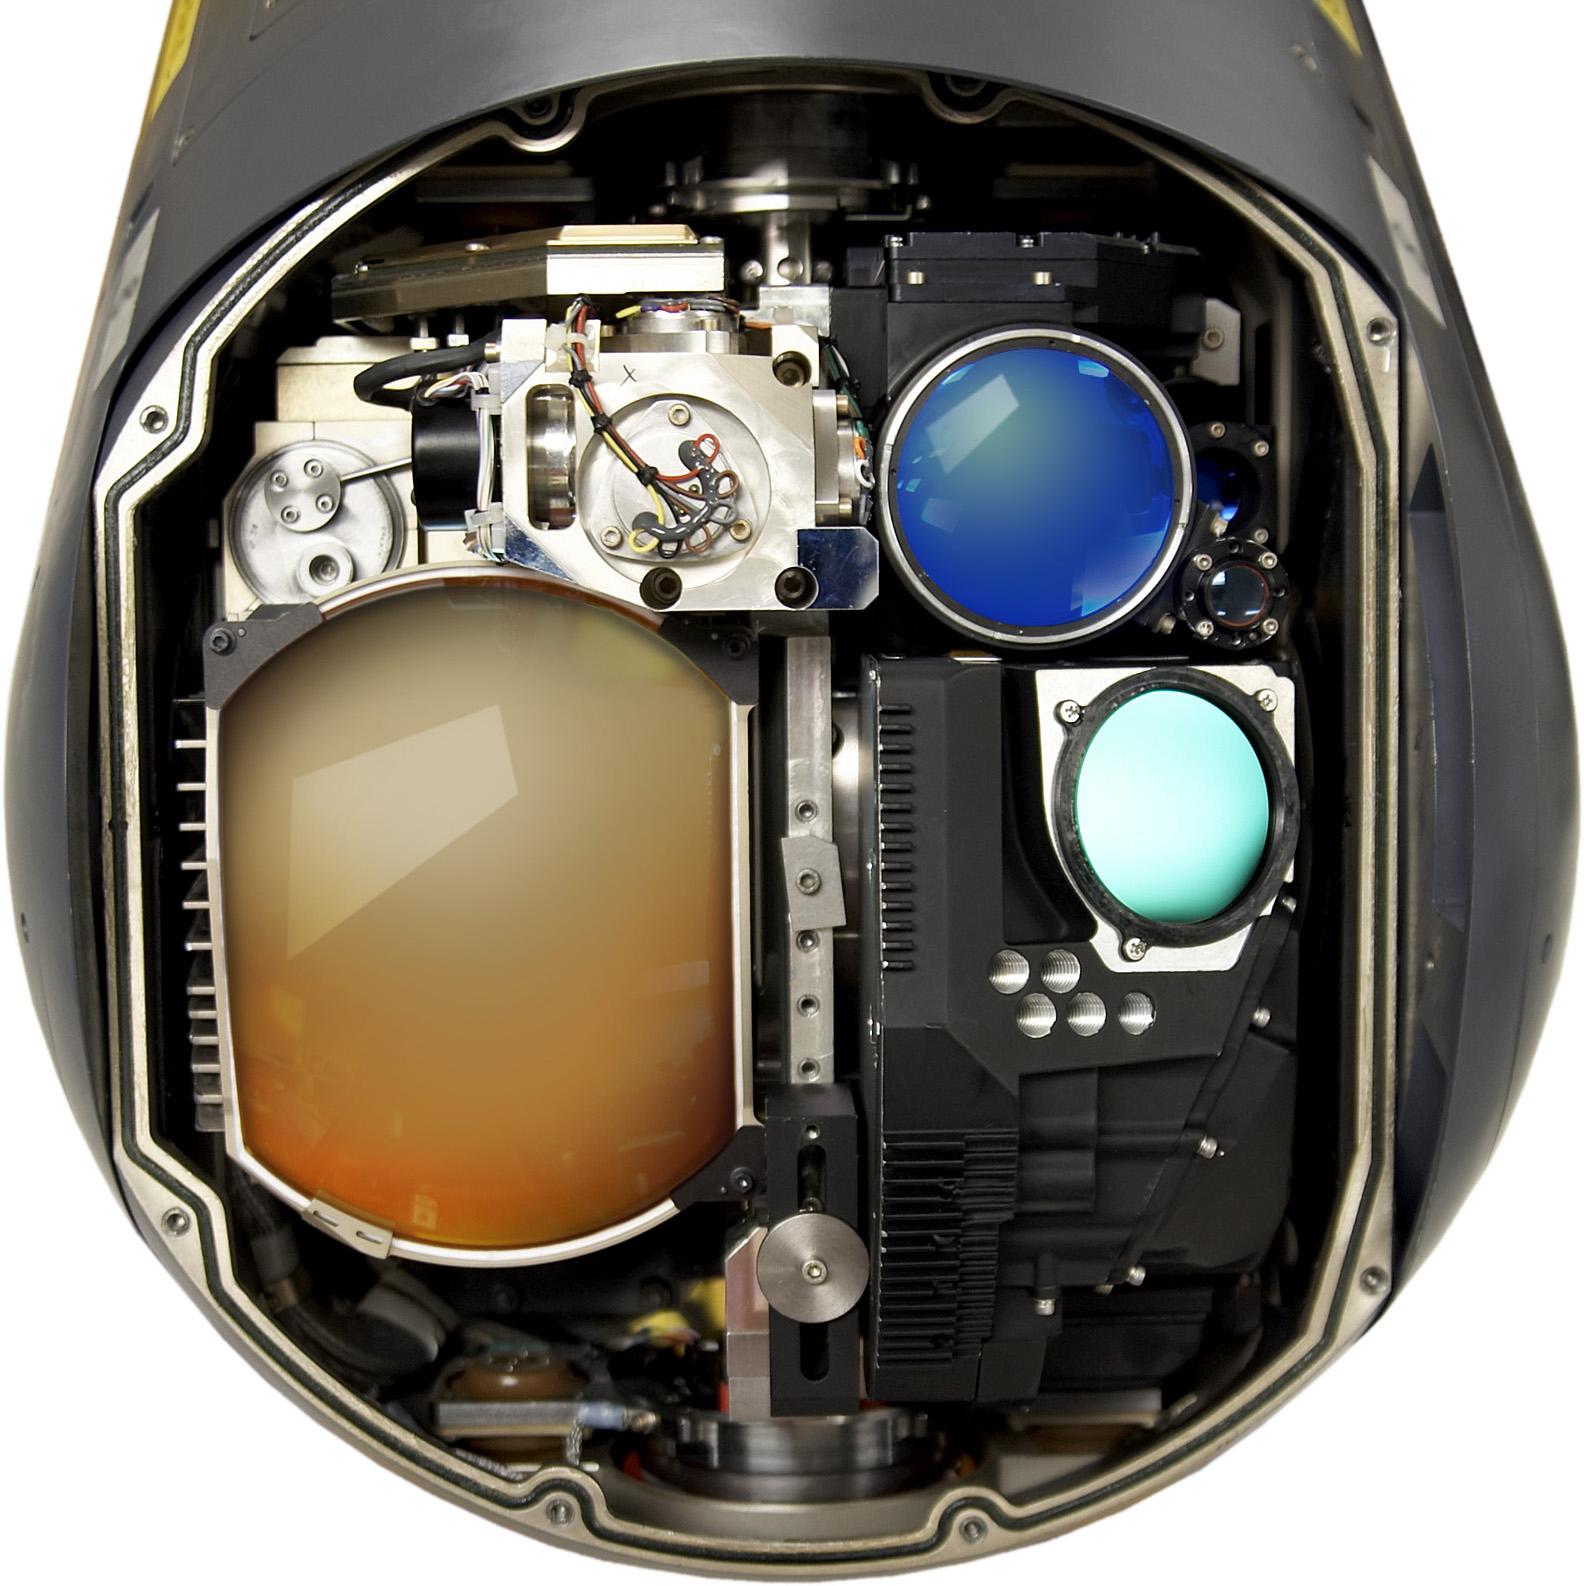 Northrop Grumman's Litening pod